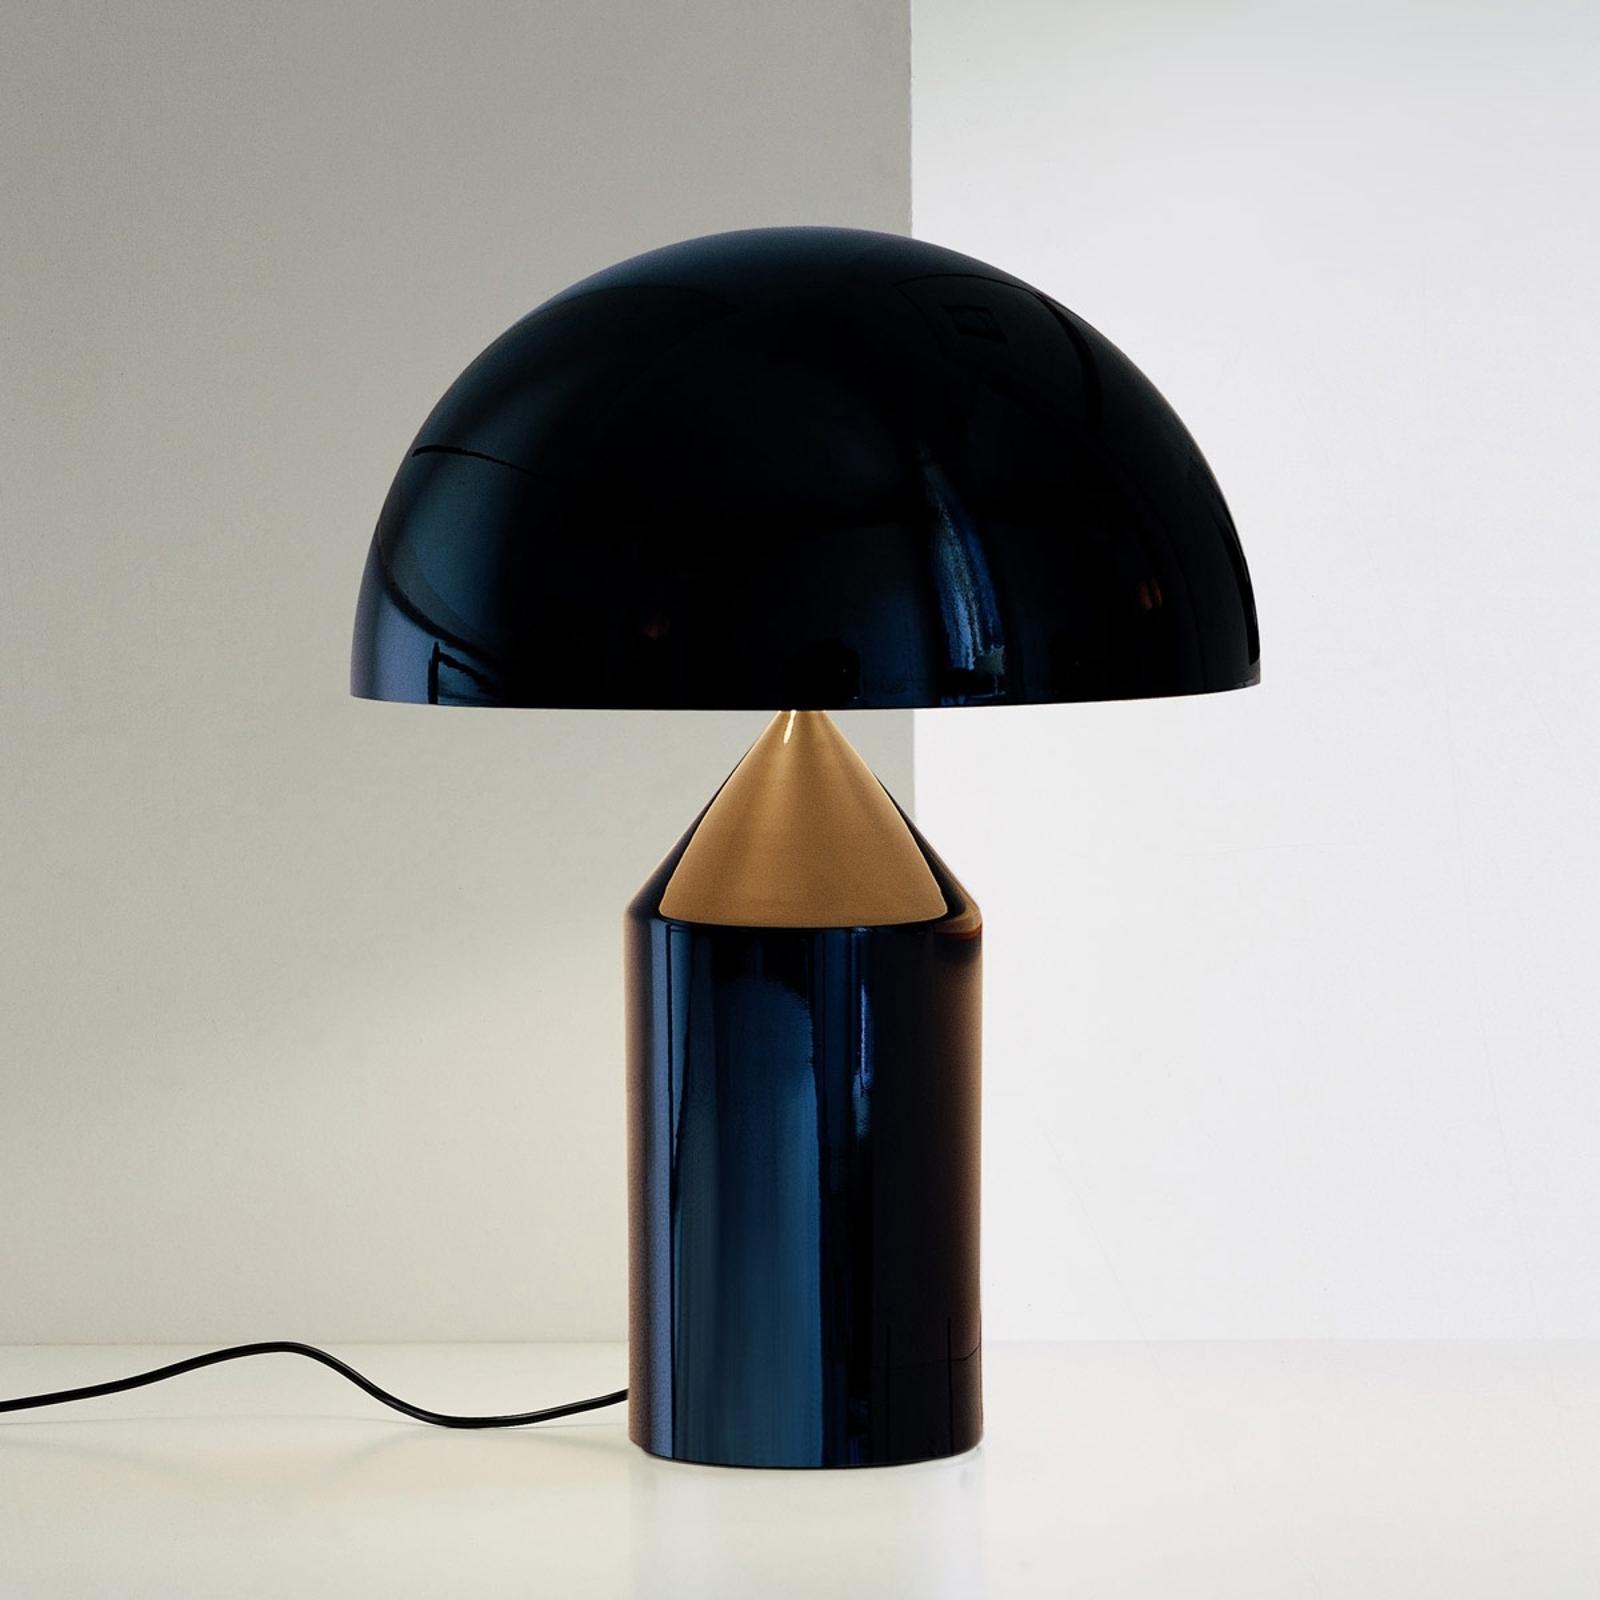 Oluce Atollo - tafellamp met dimmer, zwart